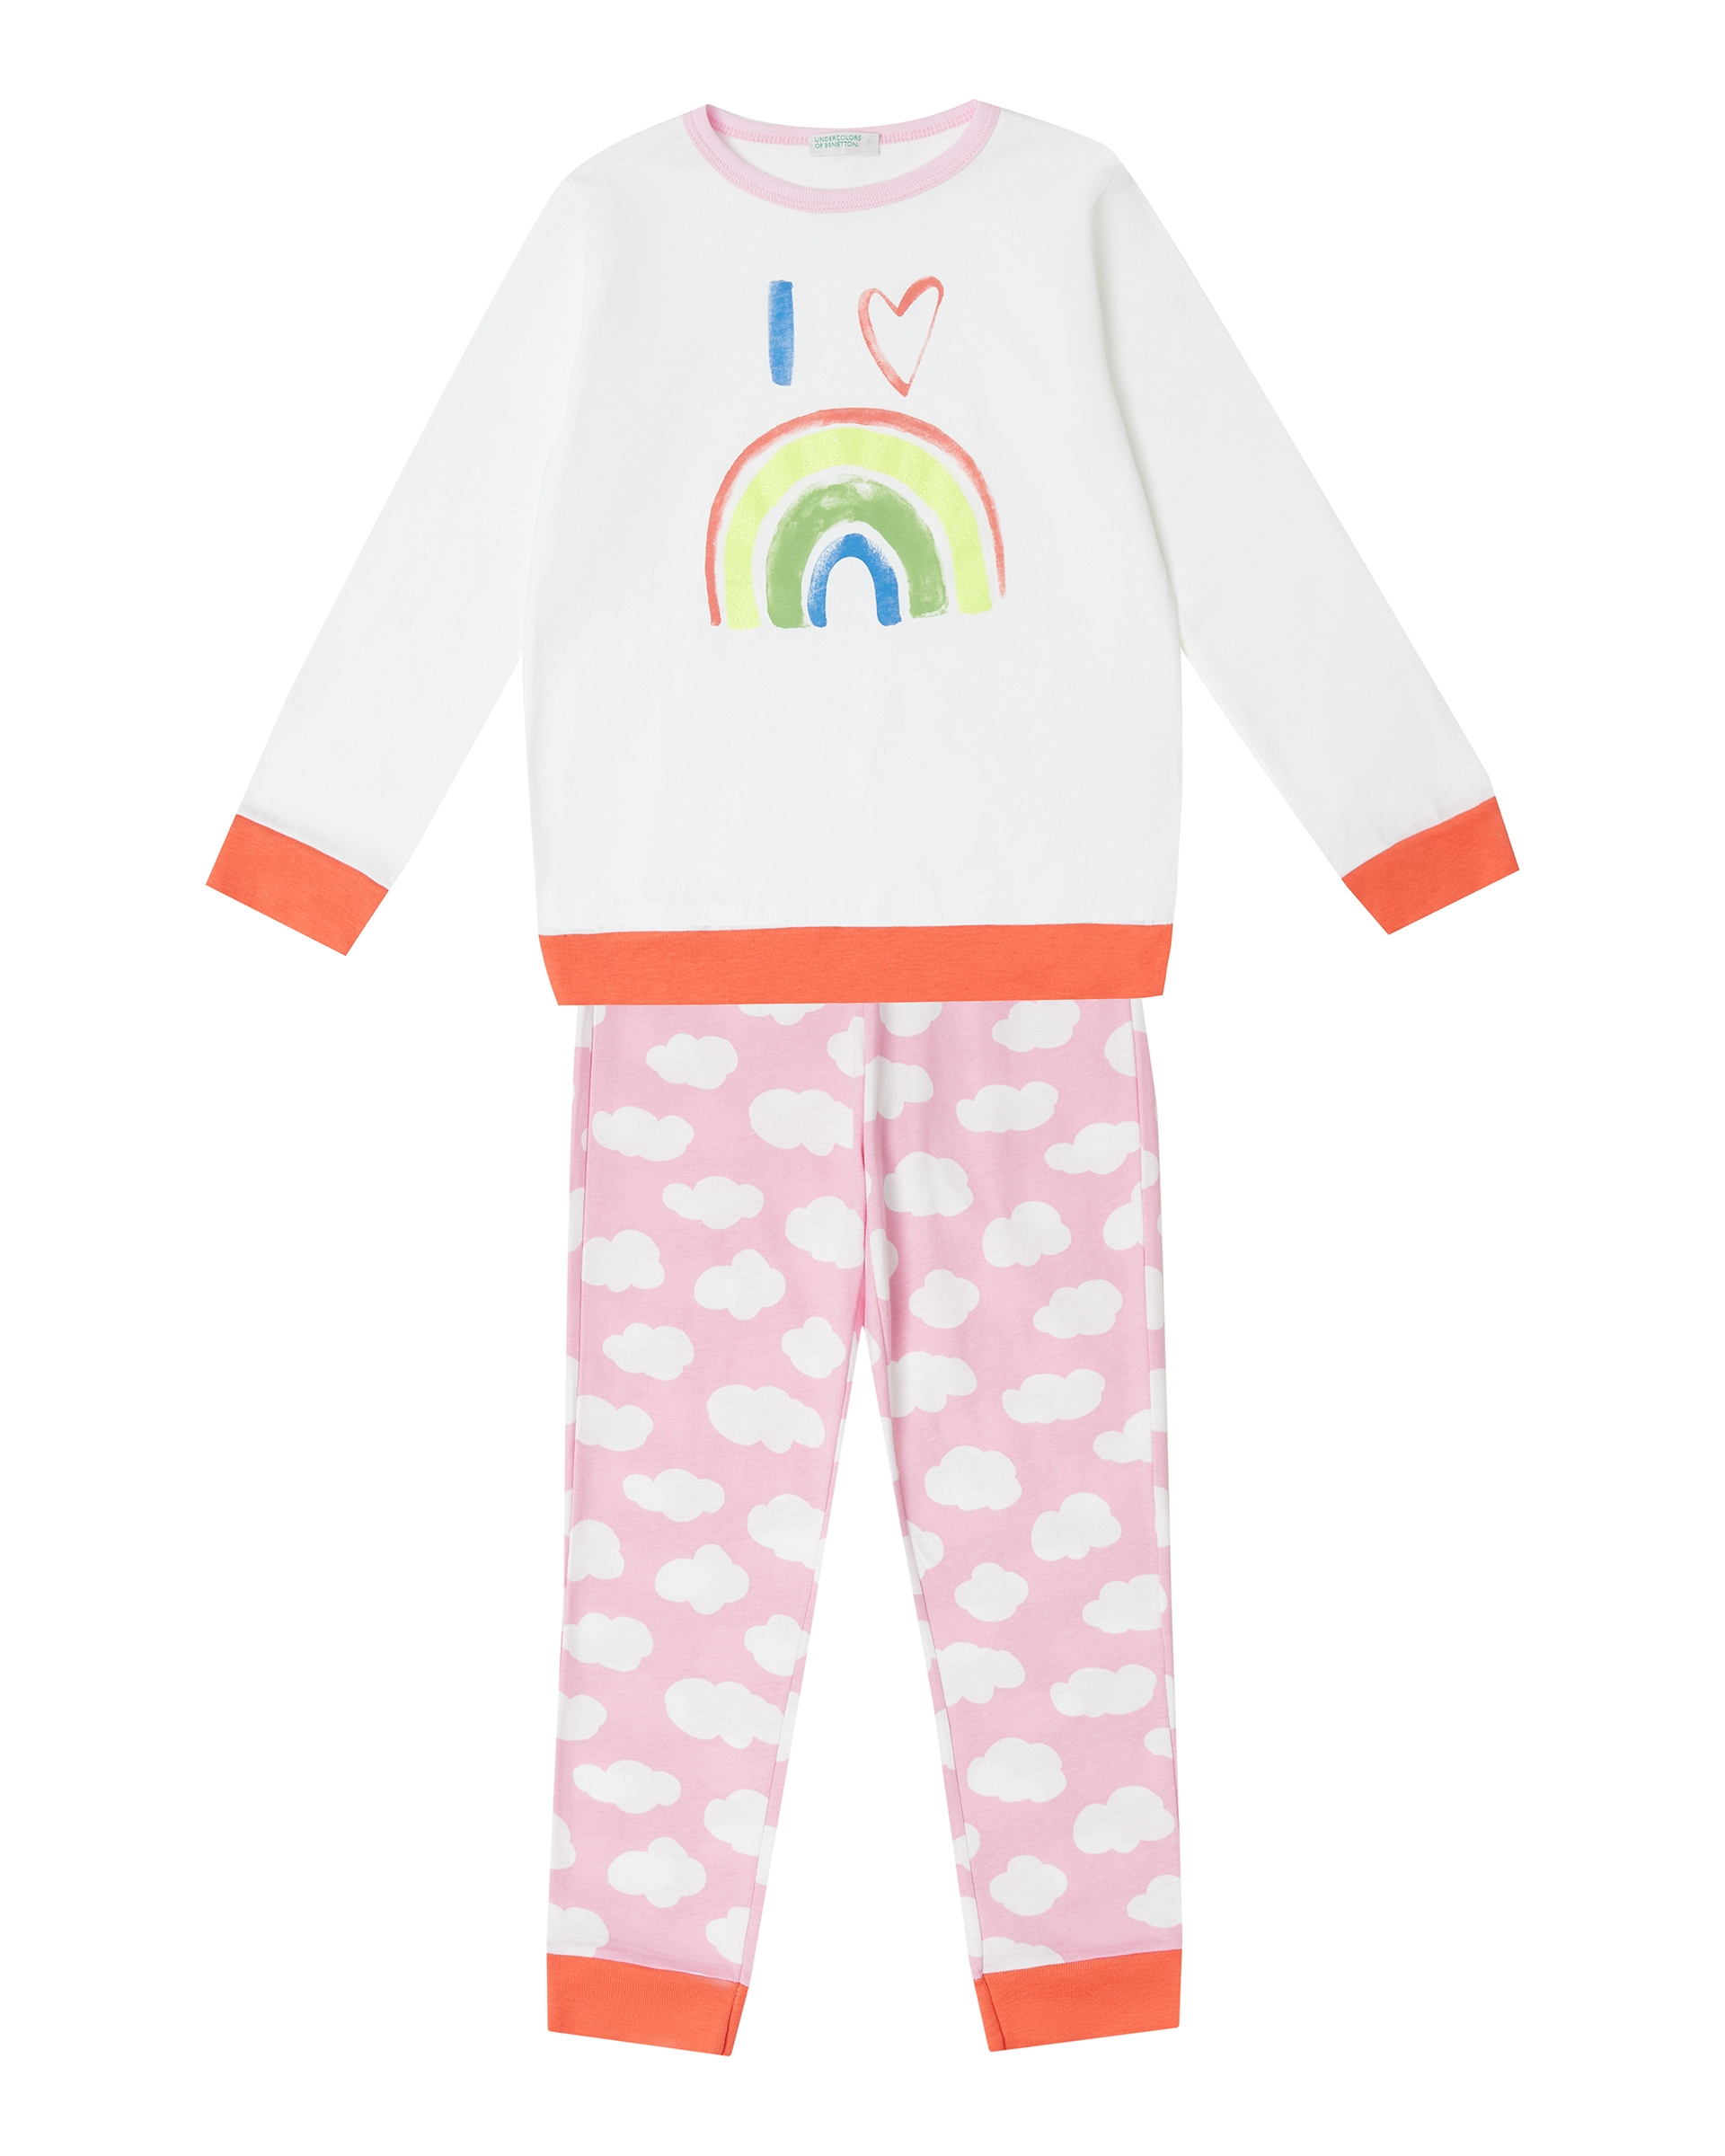 Купить 20P_30960P26Q_101, Пижама для девочек Benetton 30960P26Q_101 р-р 110, United Colors of Benetton, Пижамы для девочек